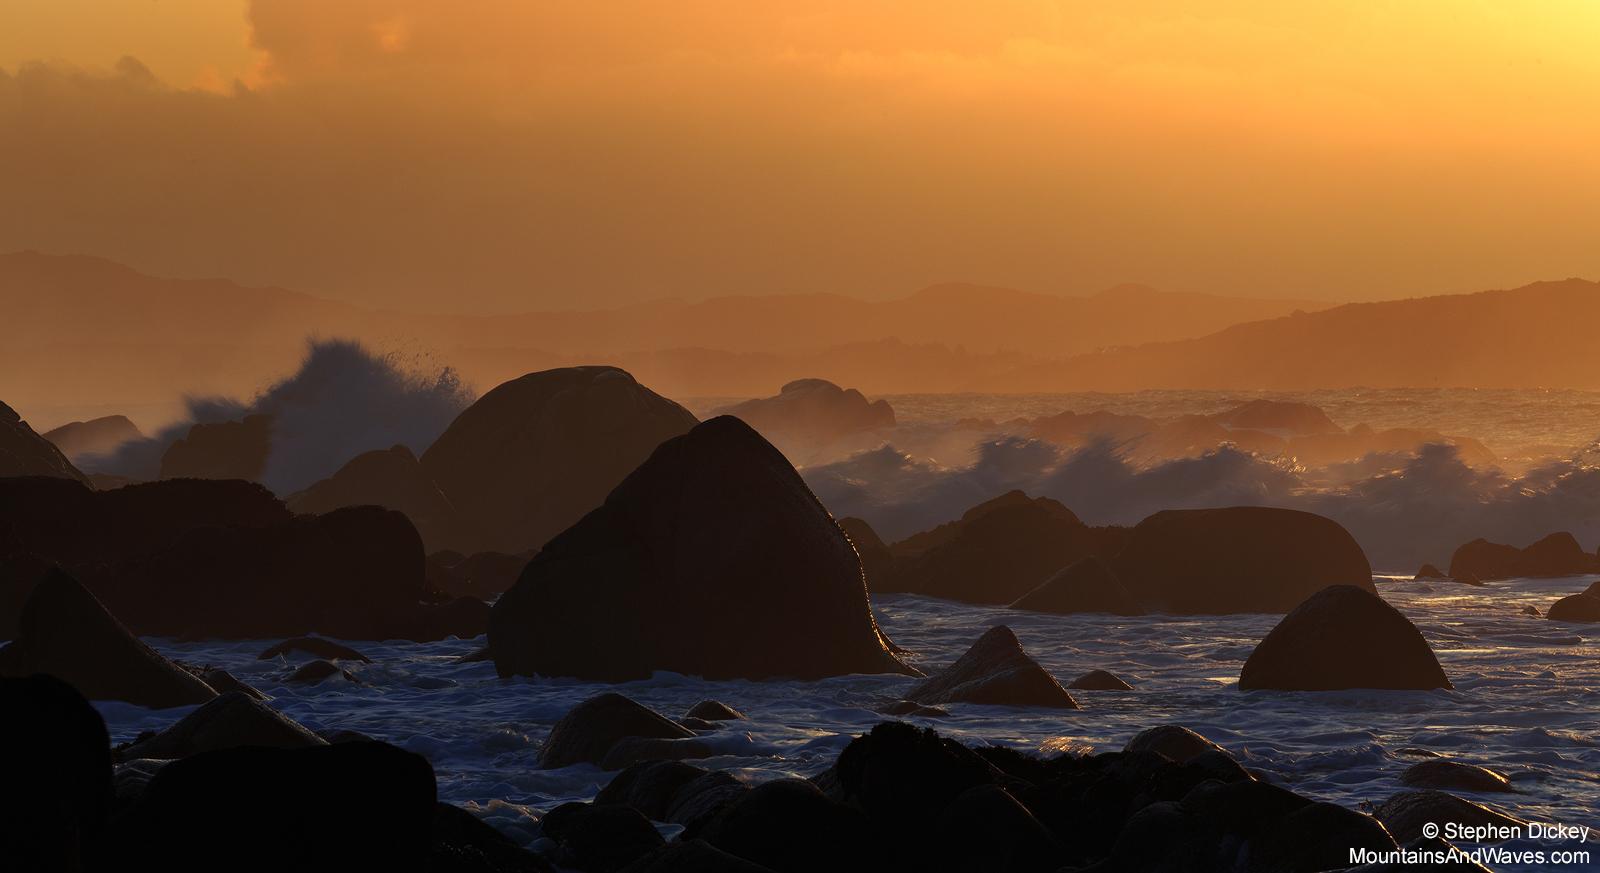 Urris-Atmosphere-Northern-Ireland-Landscape-Photography.jpg